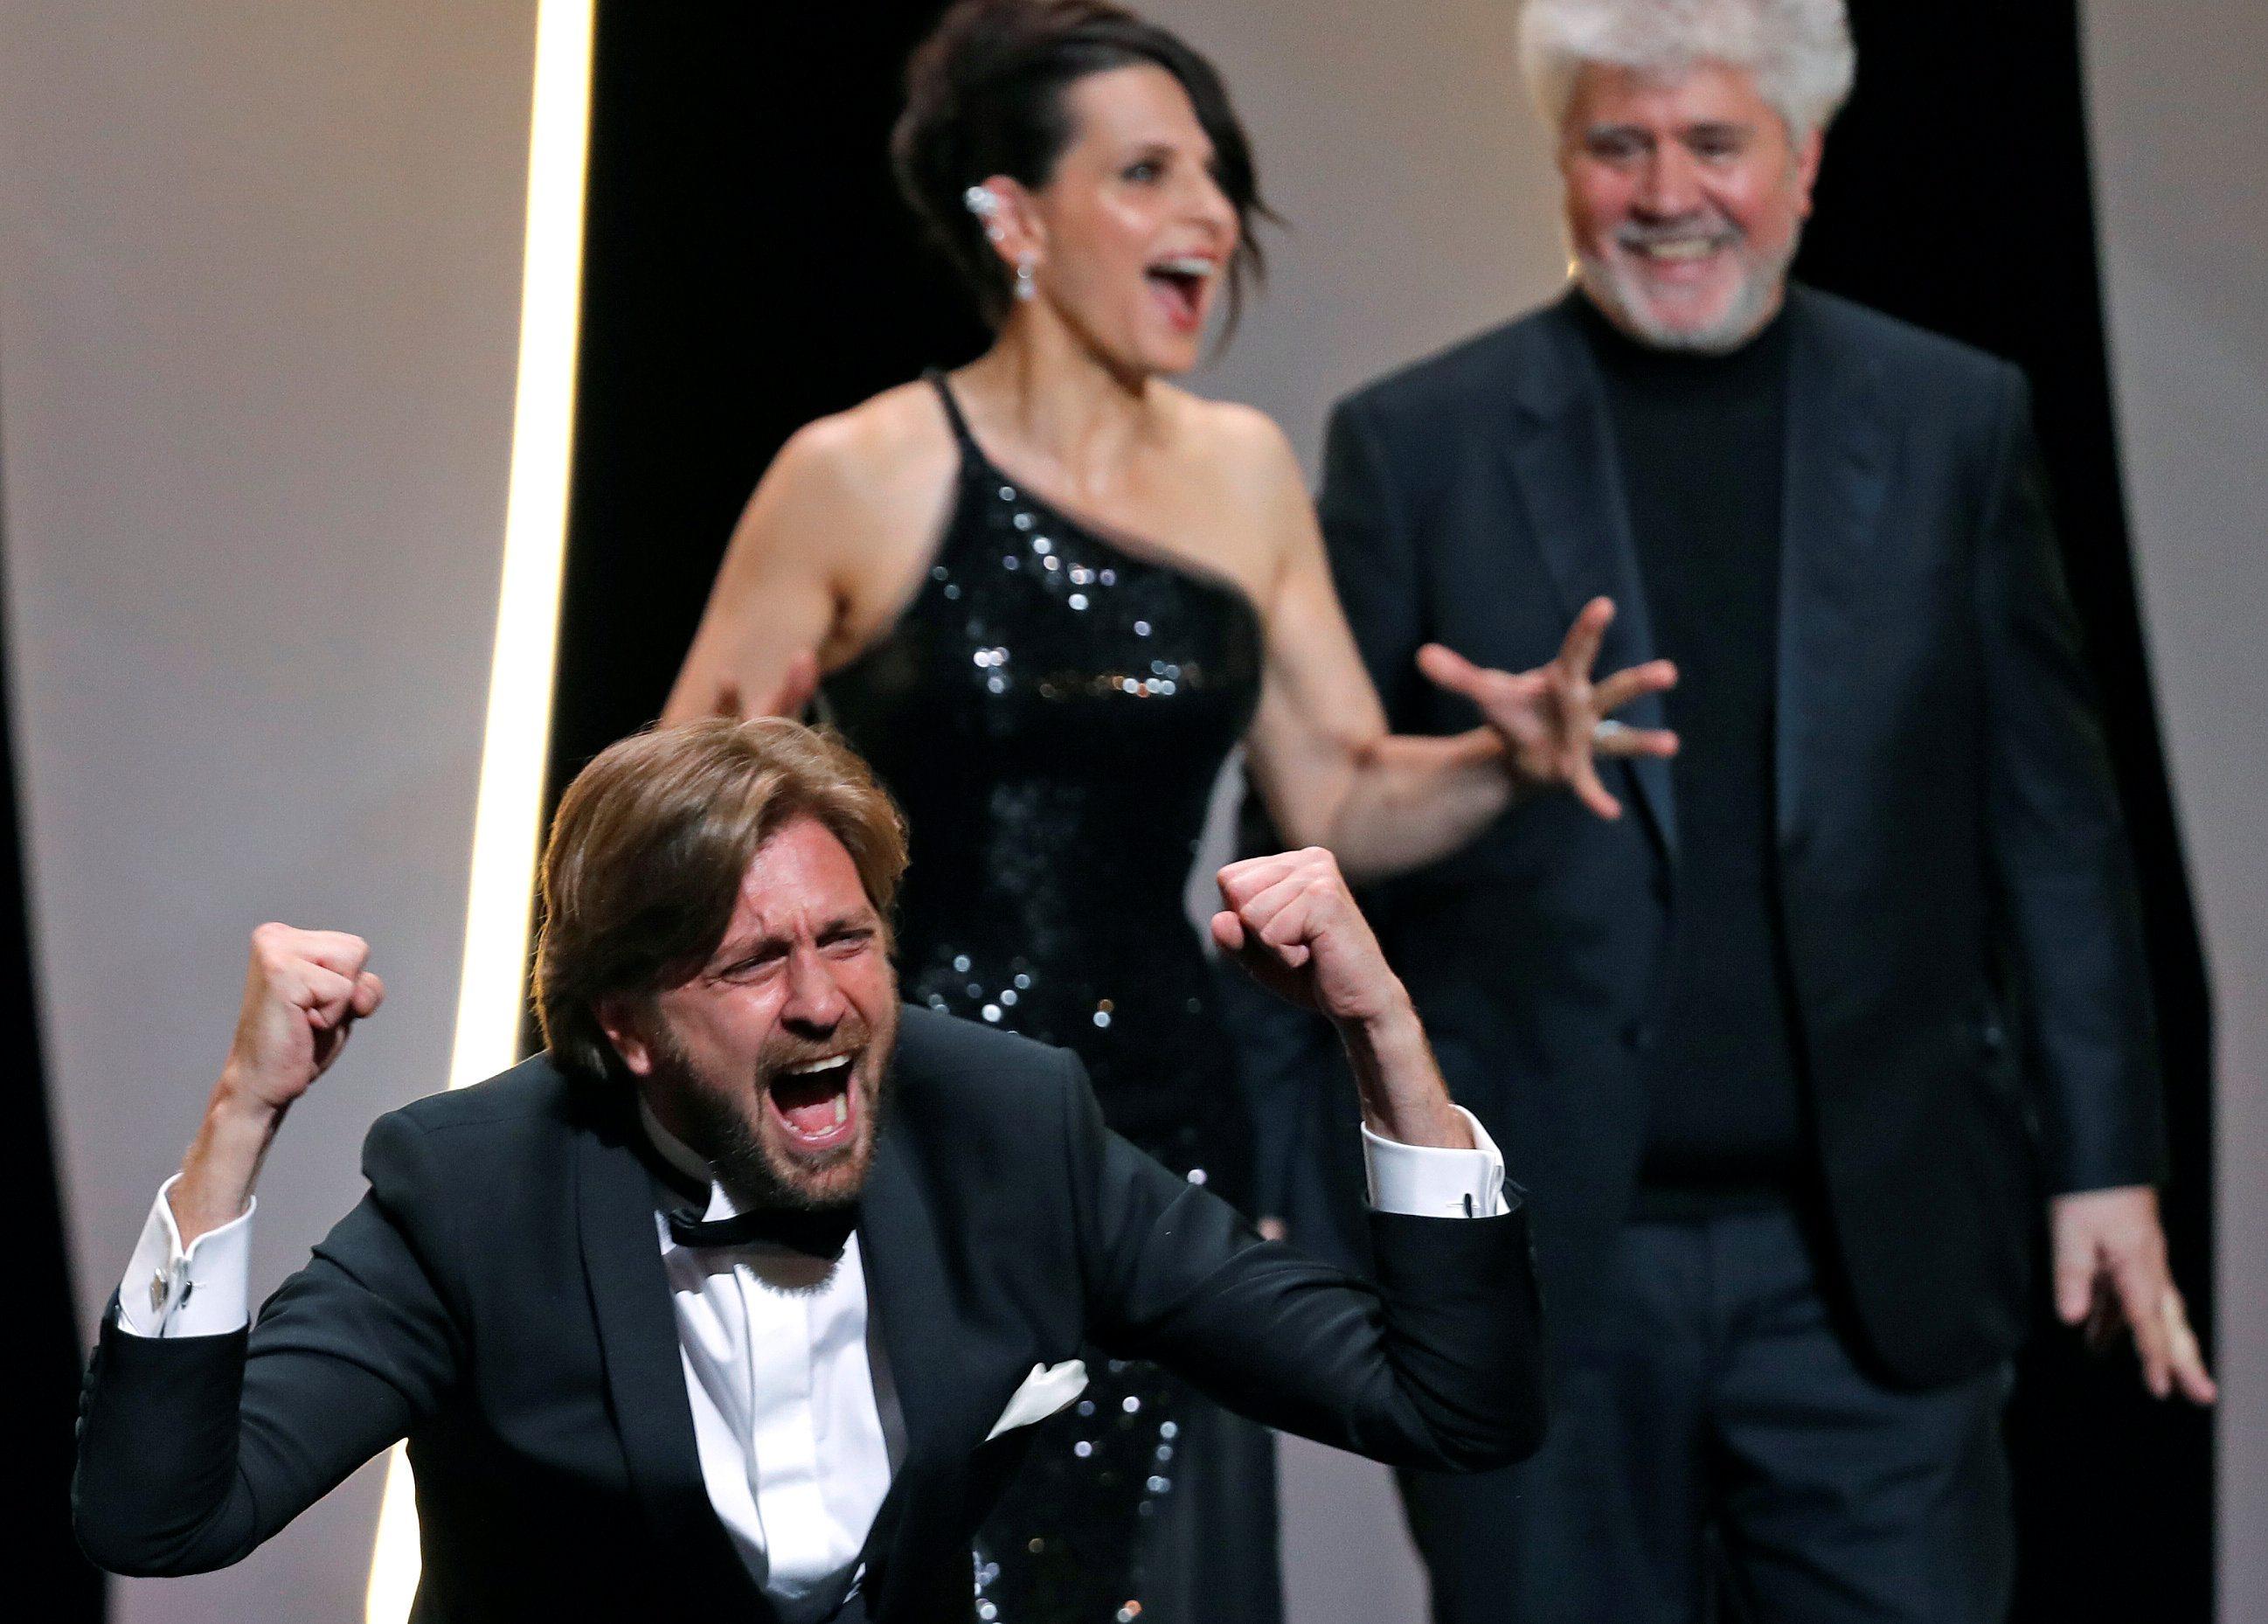 70th Cannes Film Festival - Closing ceremony - Cannes, France. 28/05/2017. Director Ruben Ostlund , Palme d'Or award winner for his film